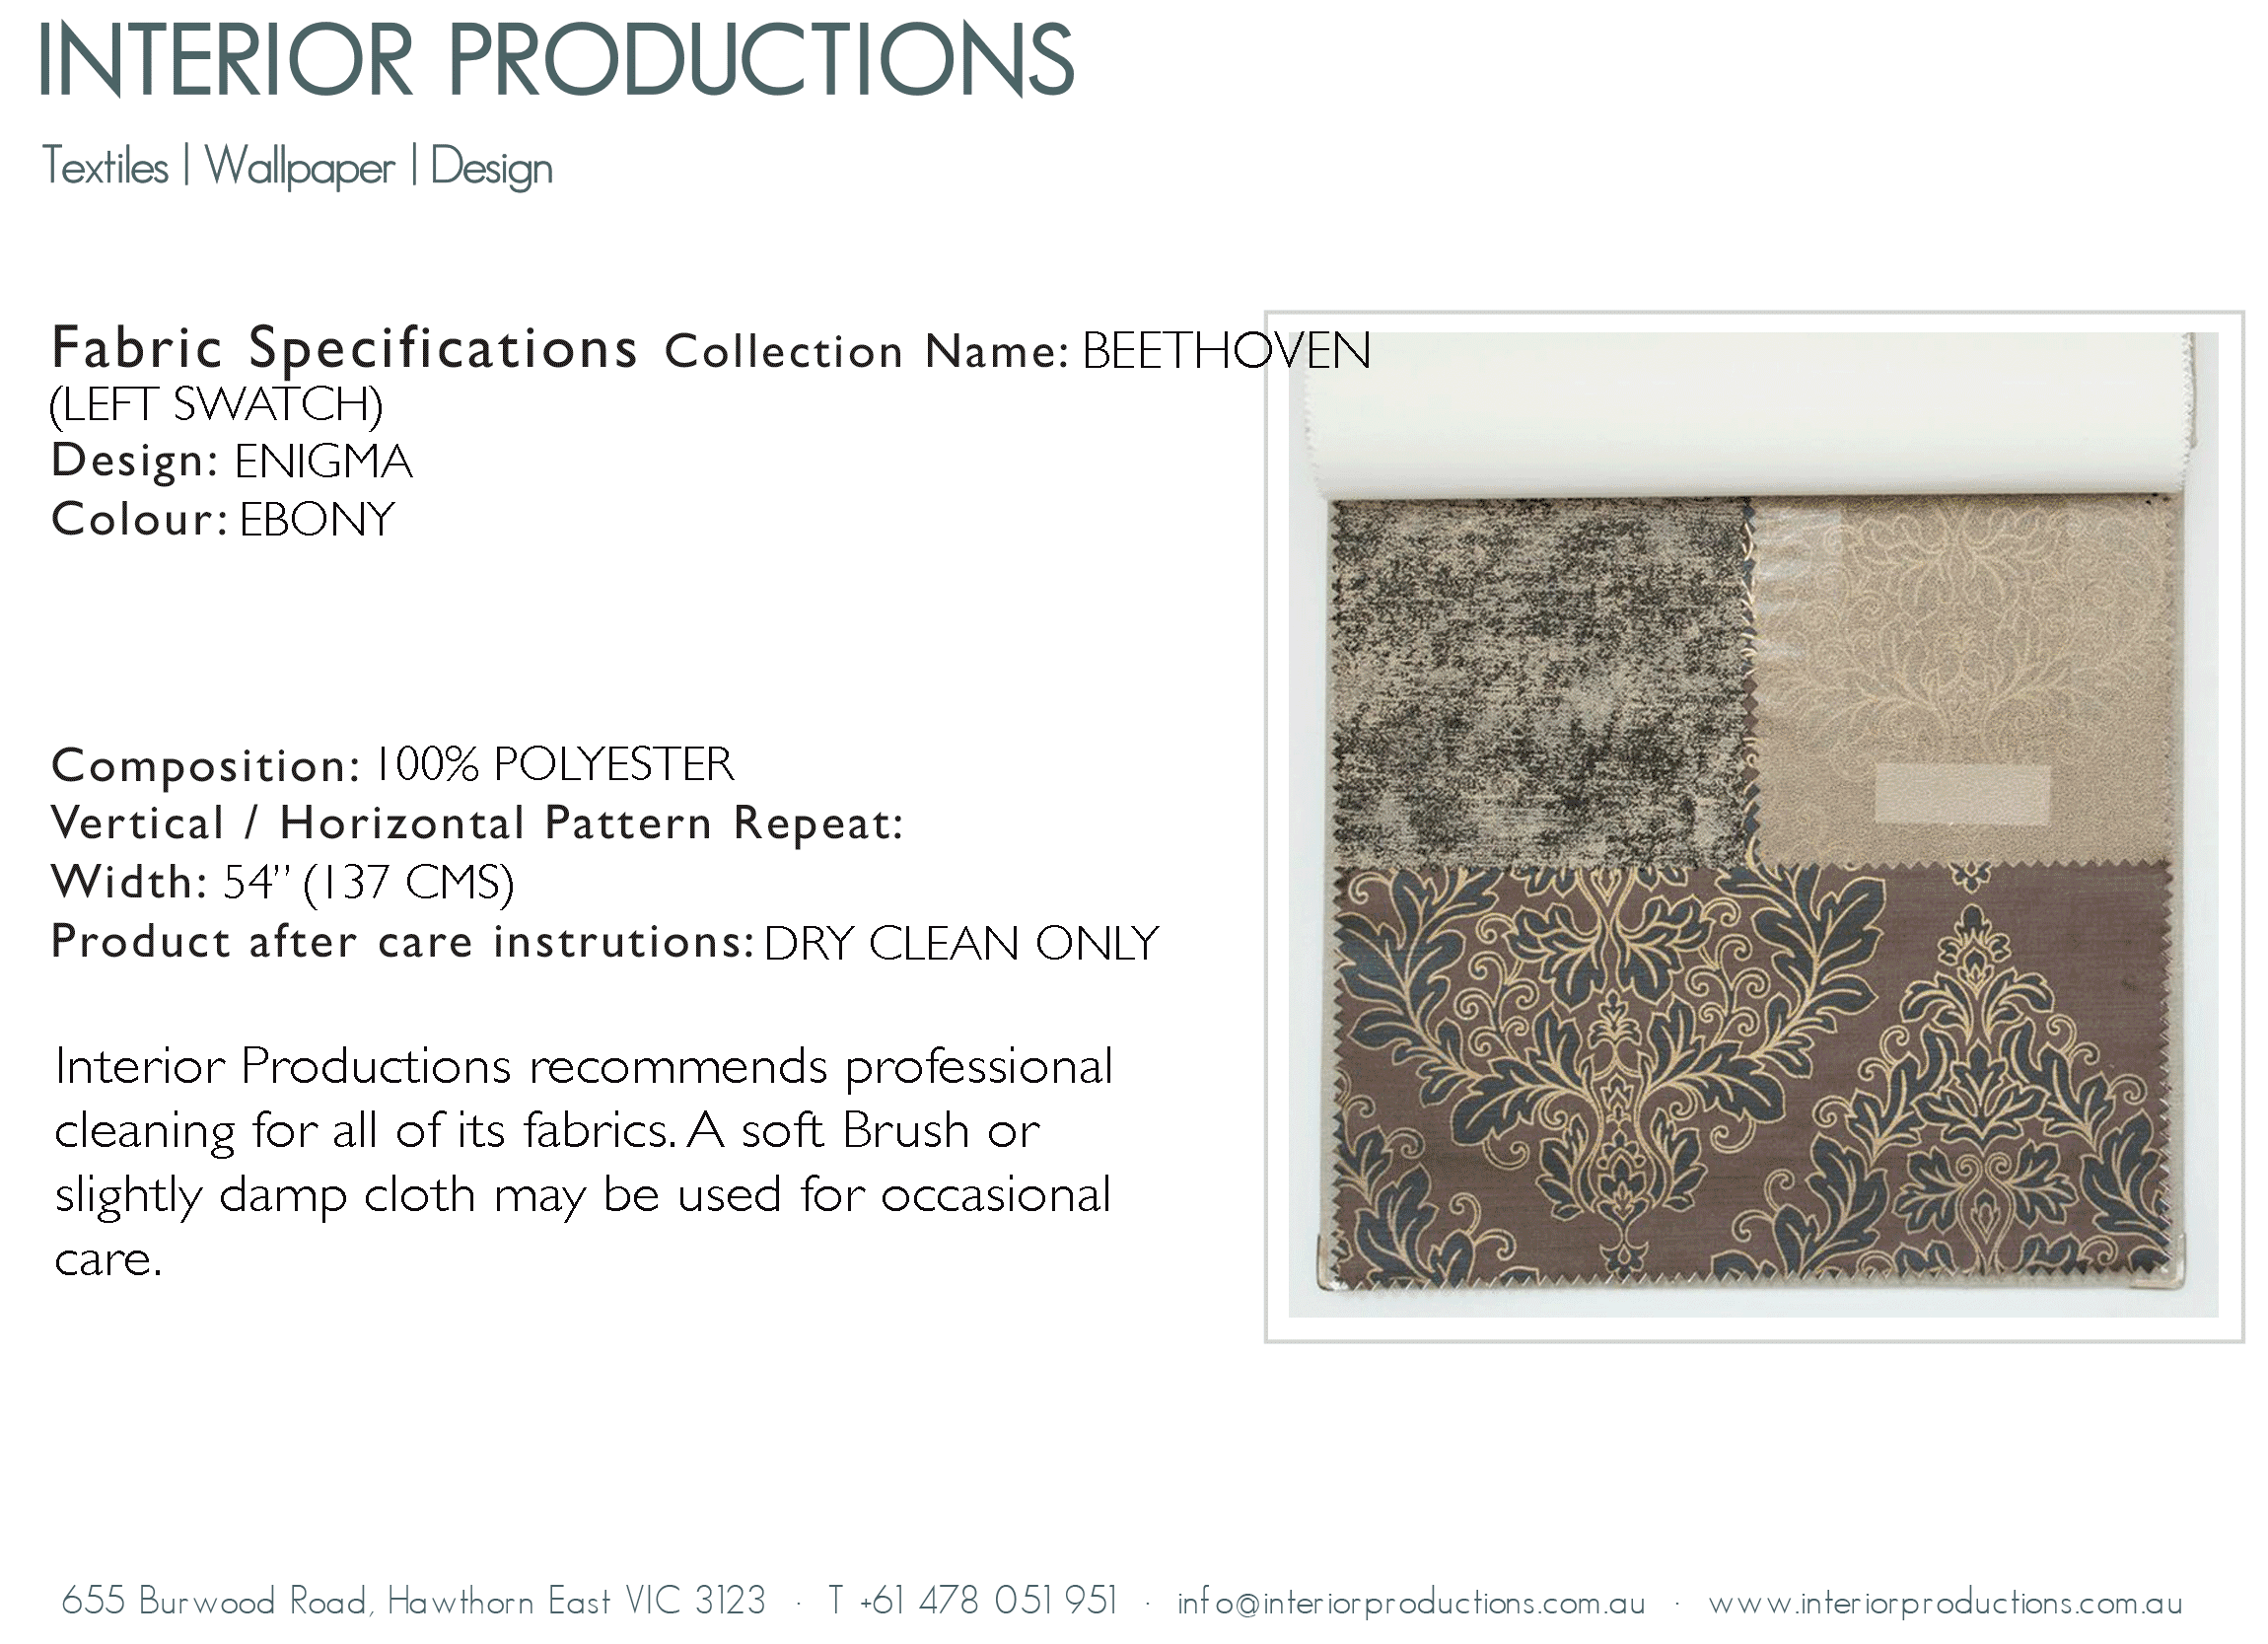 interior_productions_ENIGMA---EBONY